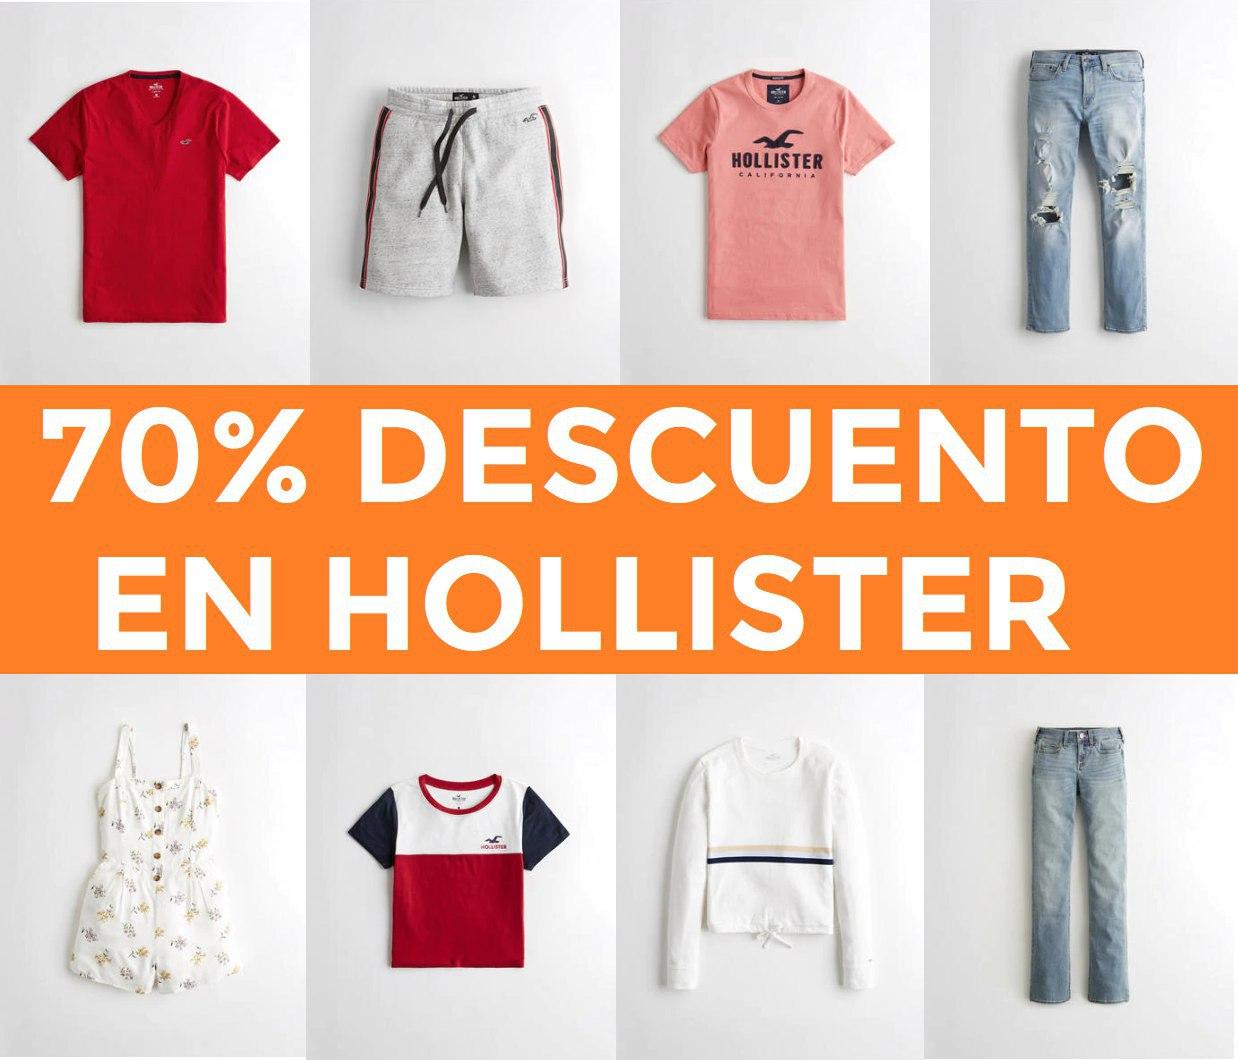 70% descuento en Hollister